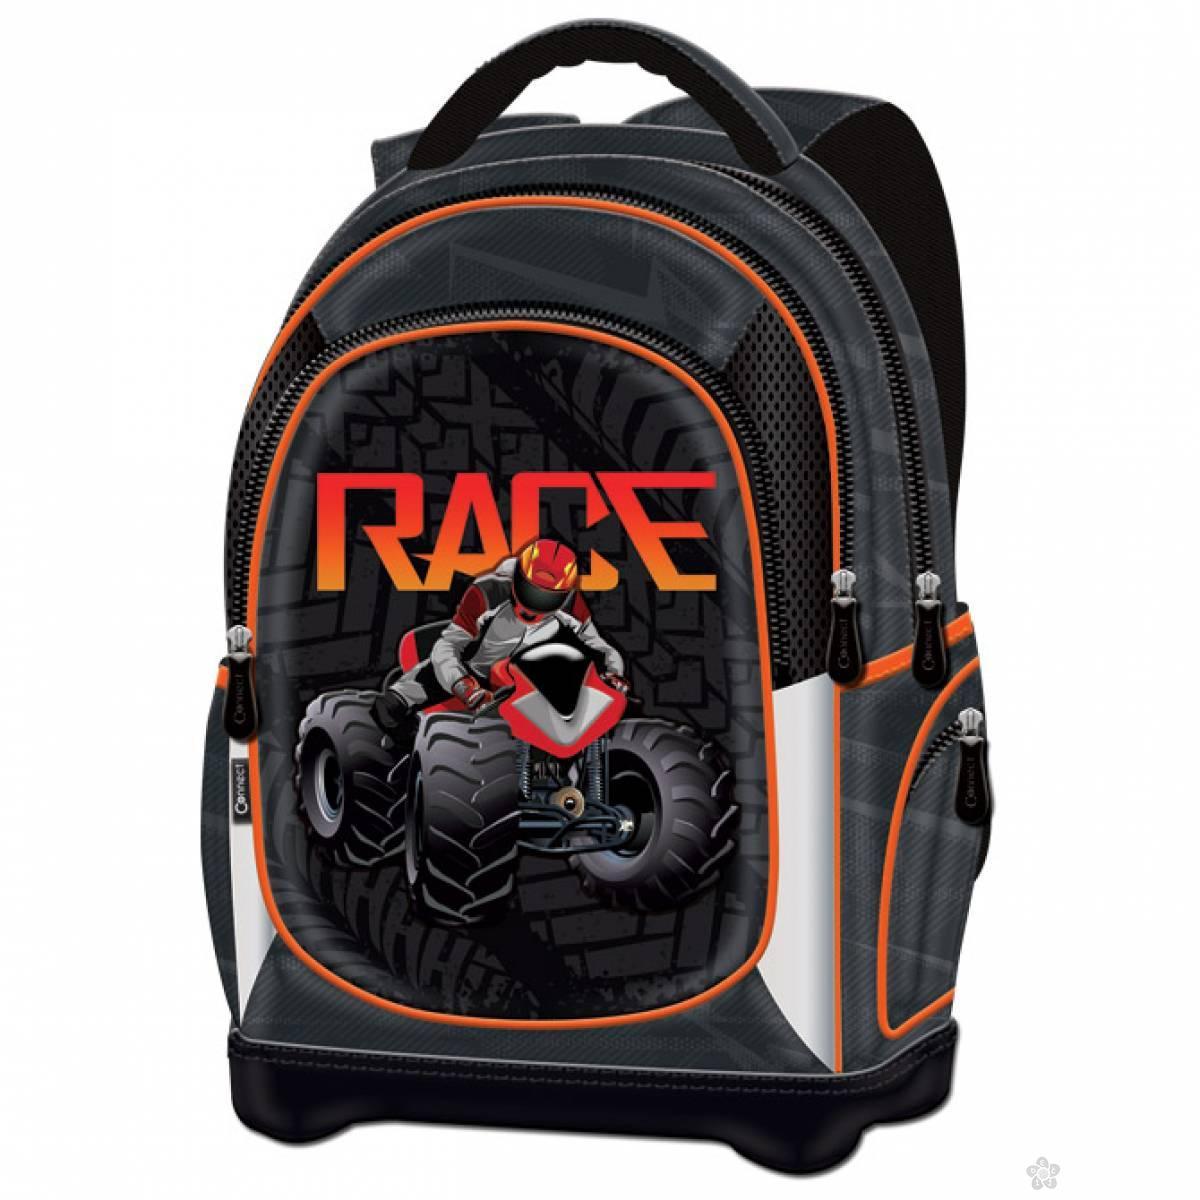 Anatomski ranac ATV Race 41970